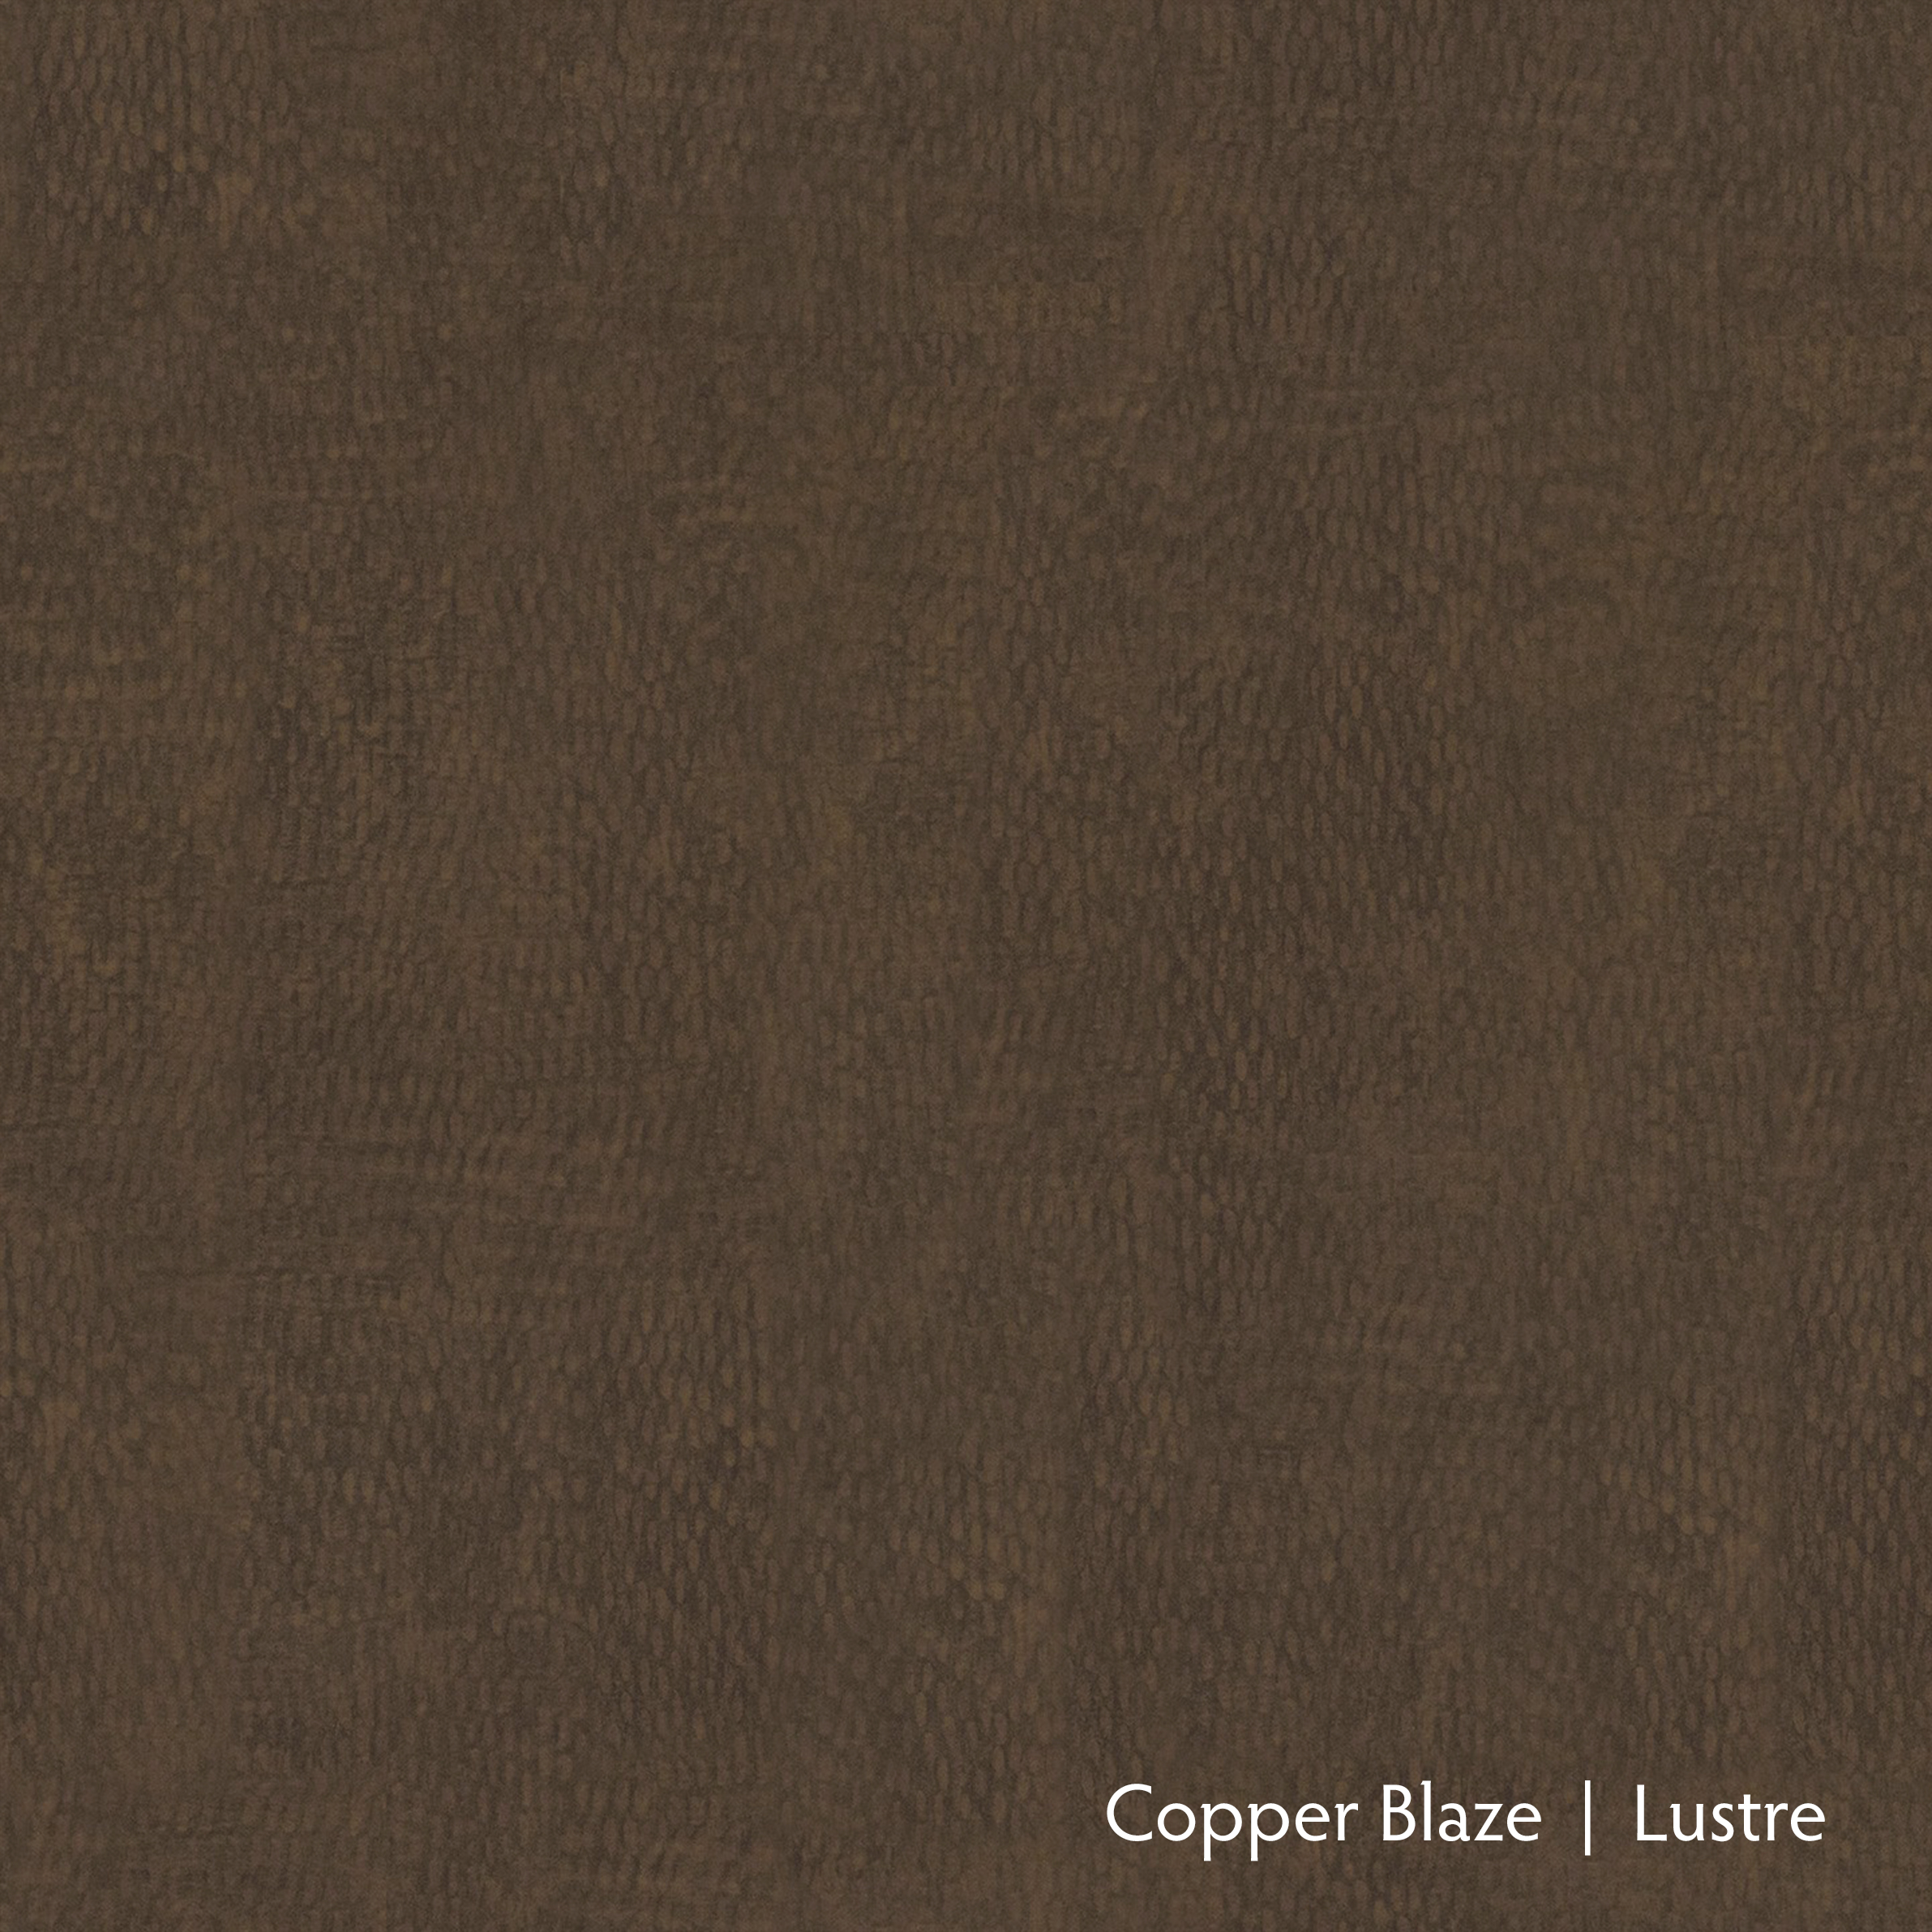 Copper Blaze